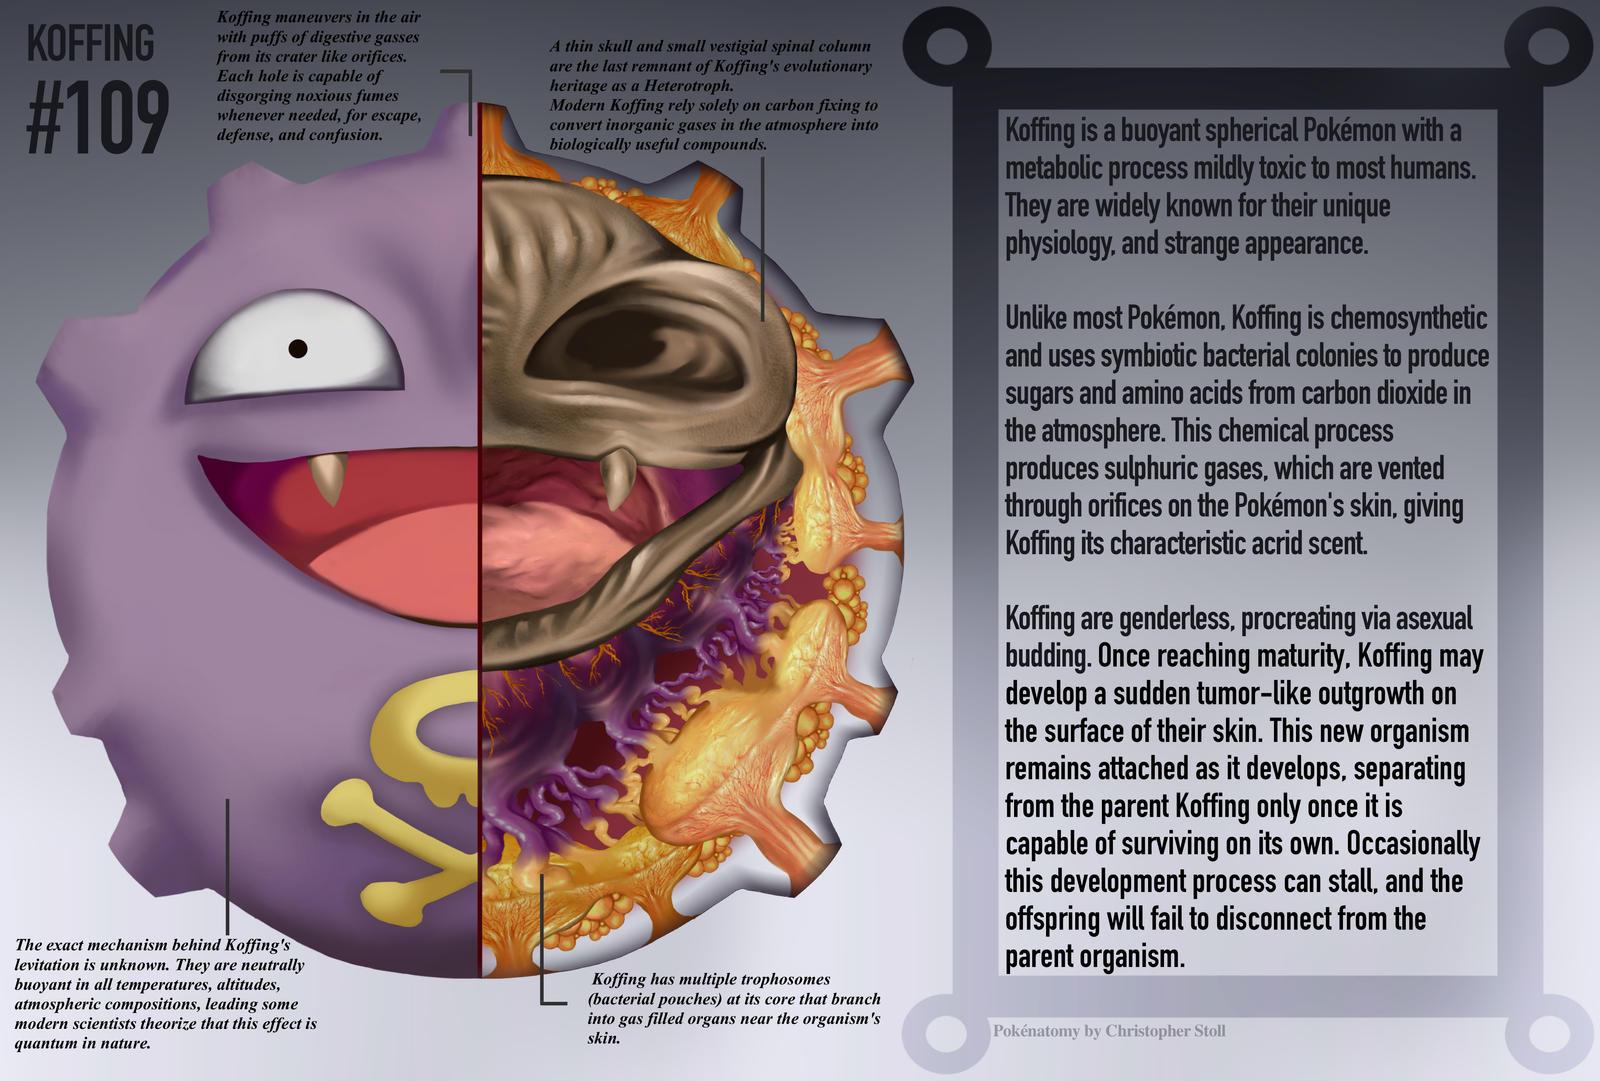 anatomical | Explore anatomical on DeviantArt